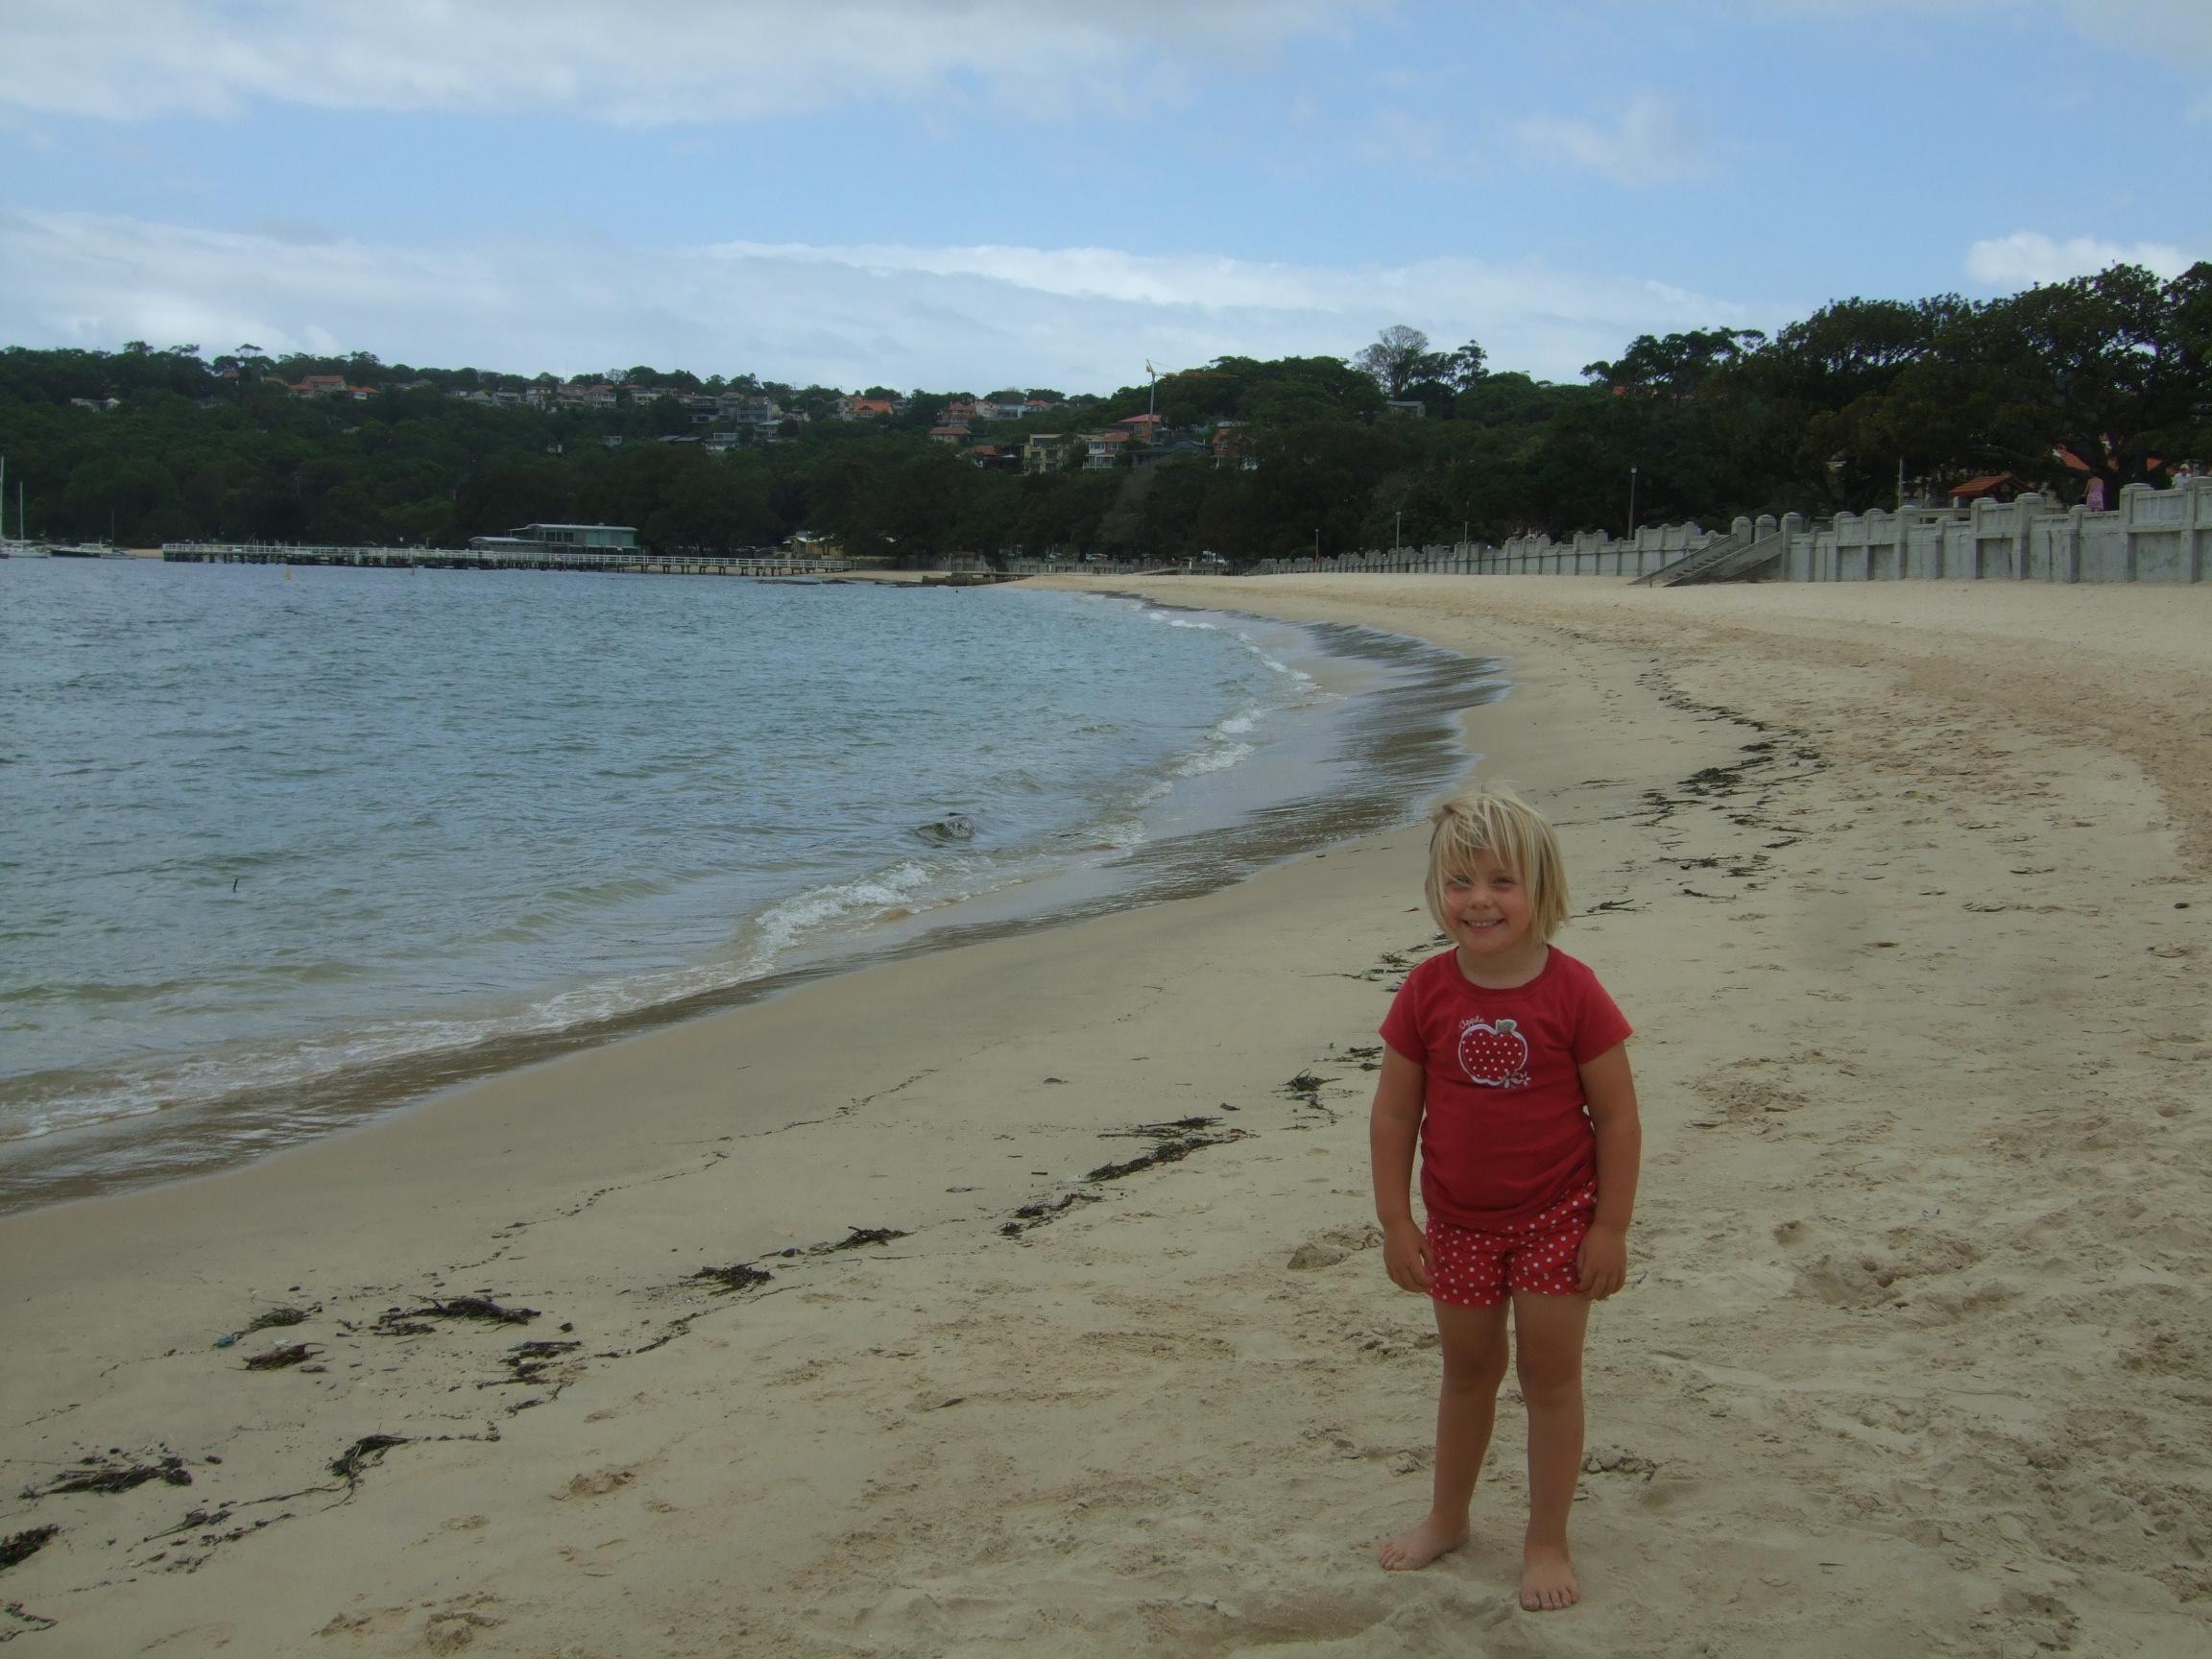 poppy-in-the-sand